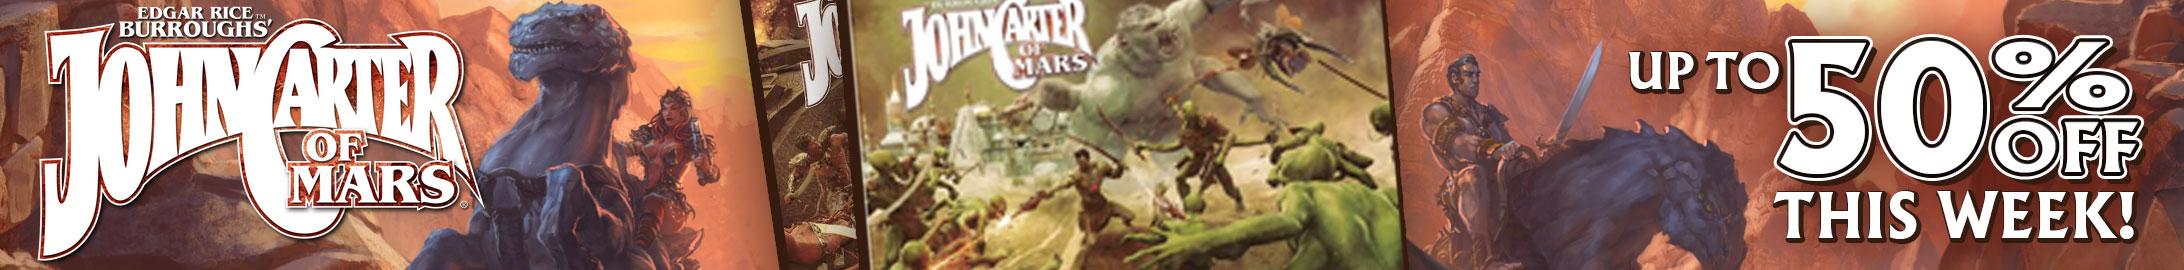 John Carter Sale @ DriveThruRPG.com